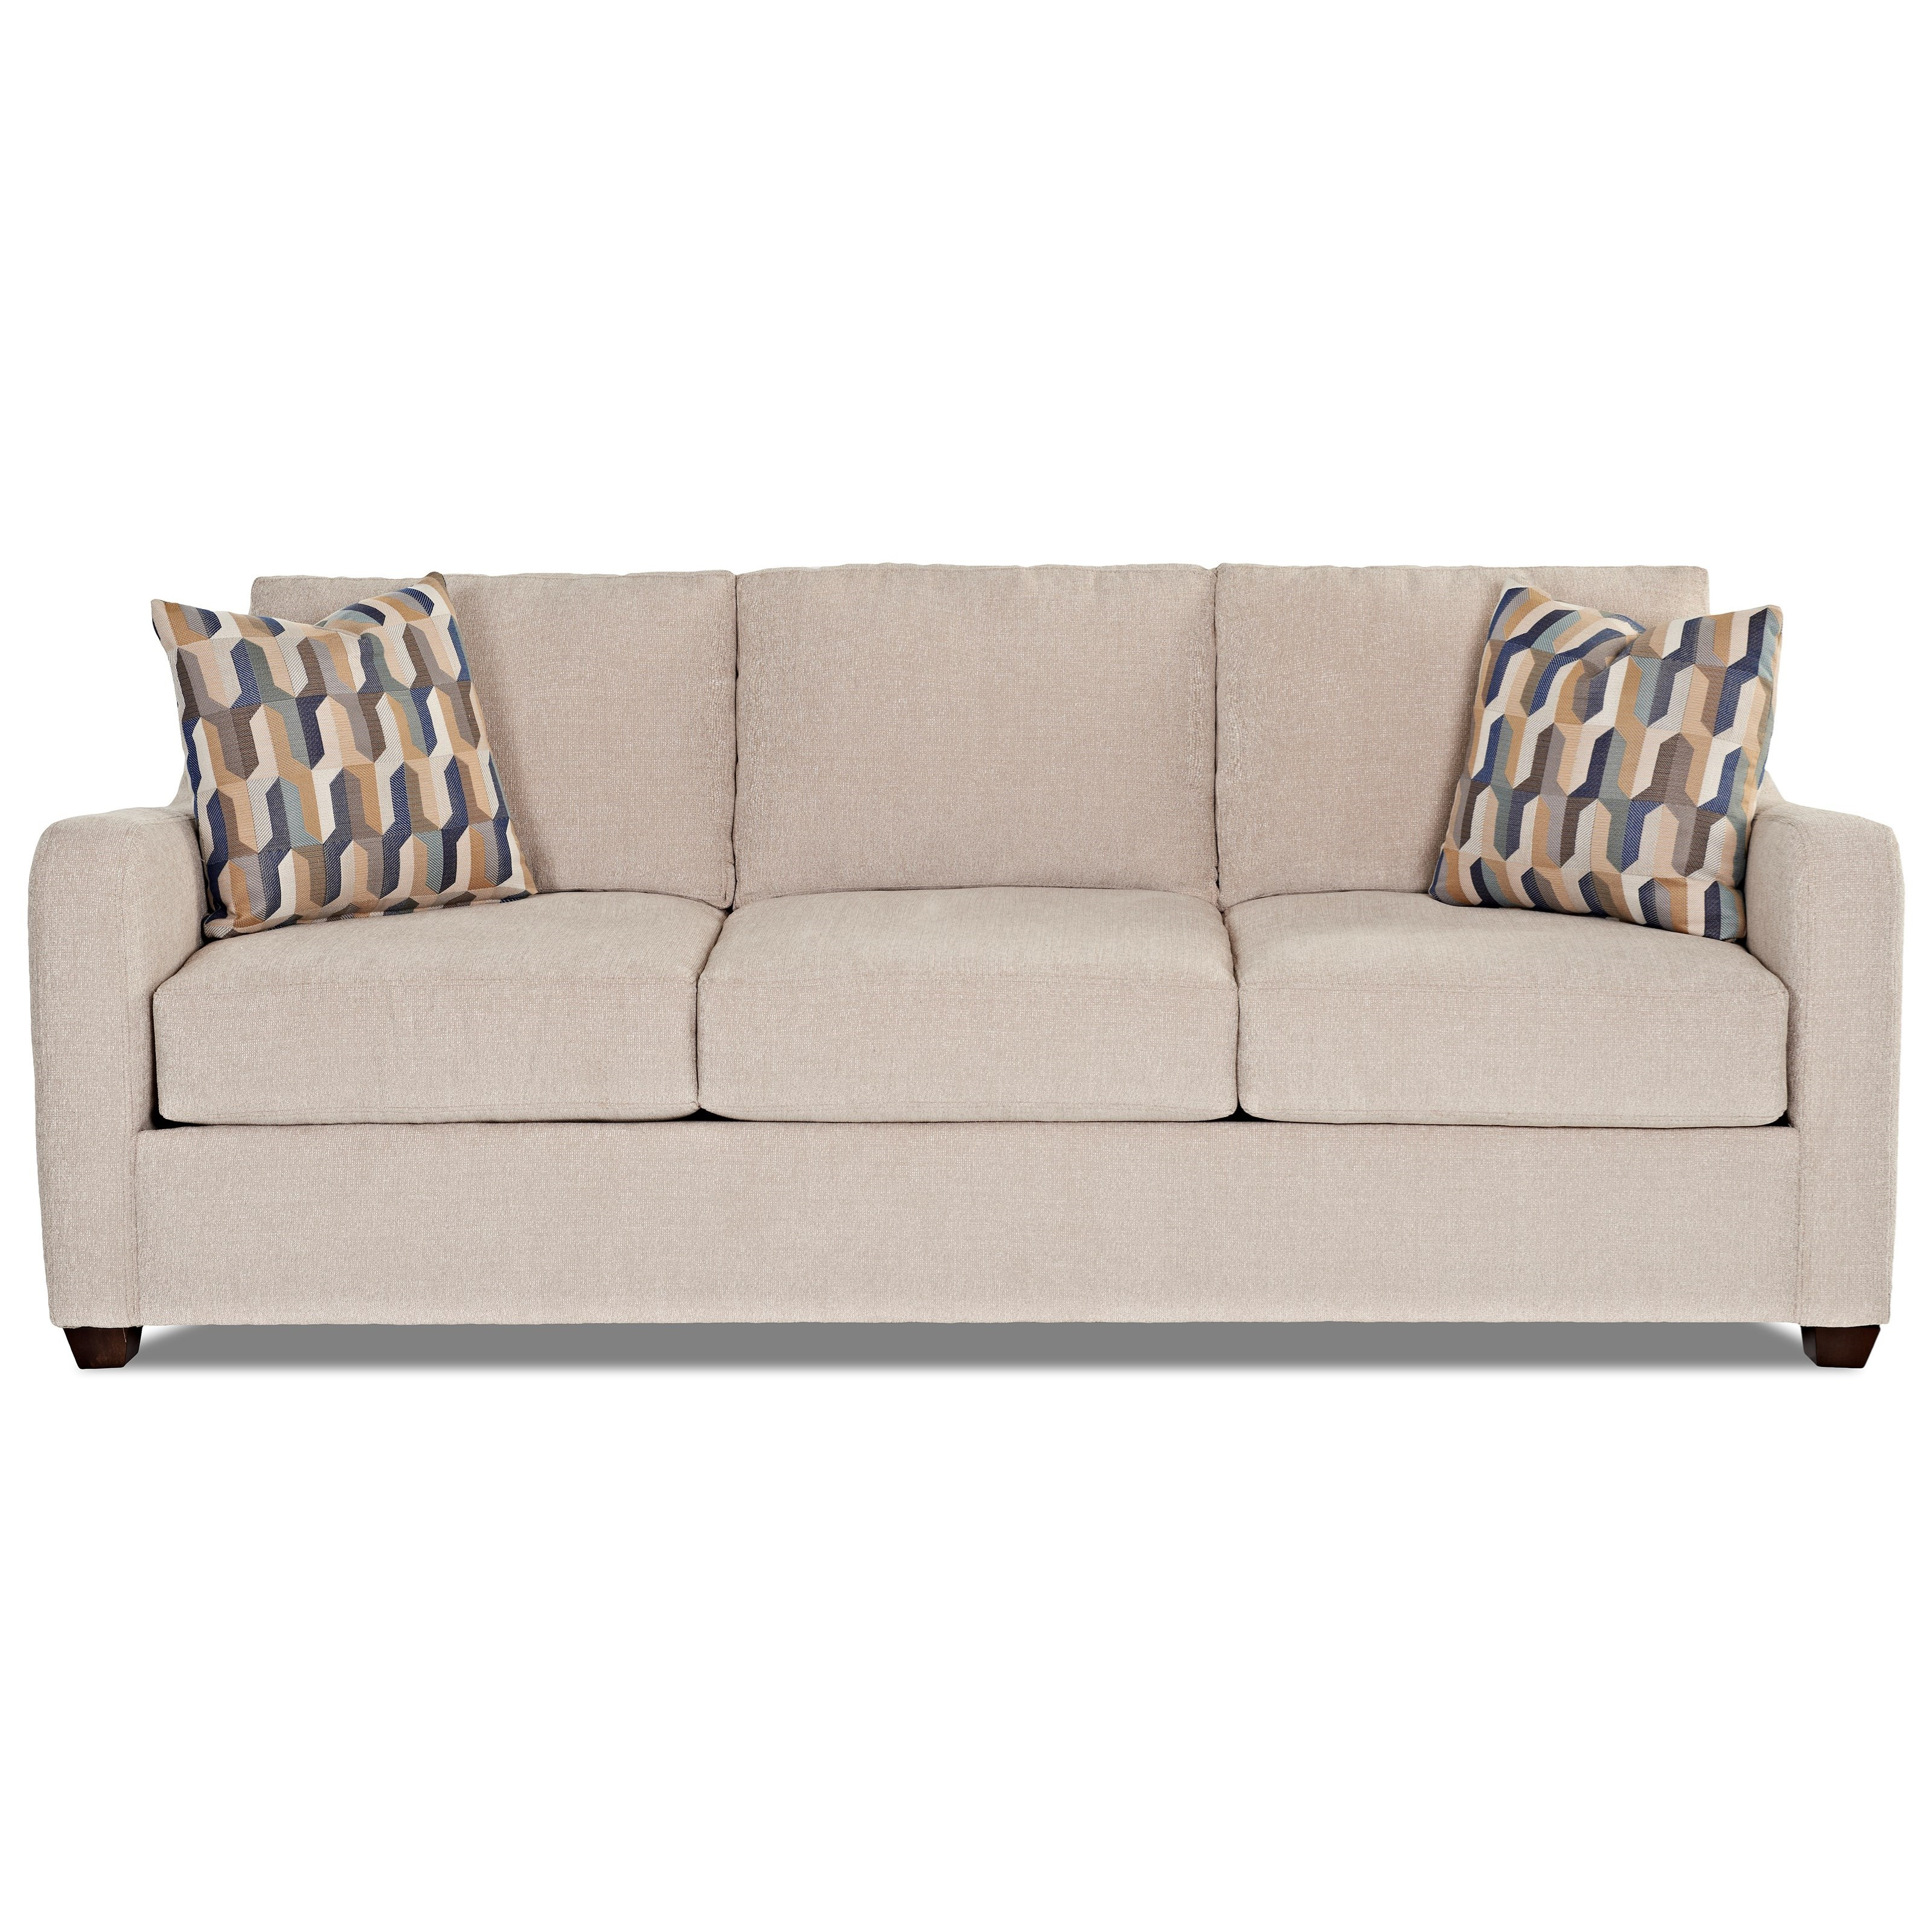 Klaussner Greer Air Coil Mattress Queen Sleeper Sofa - Item Number: K29200 AQSL-THEO - PLAT